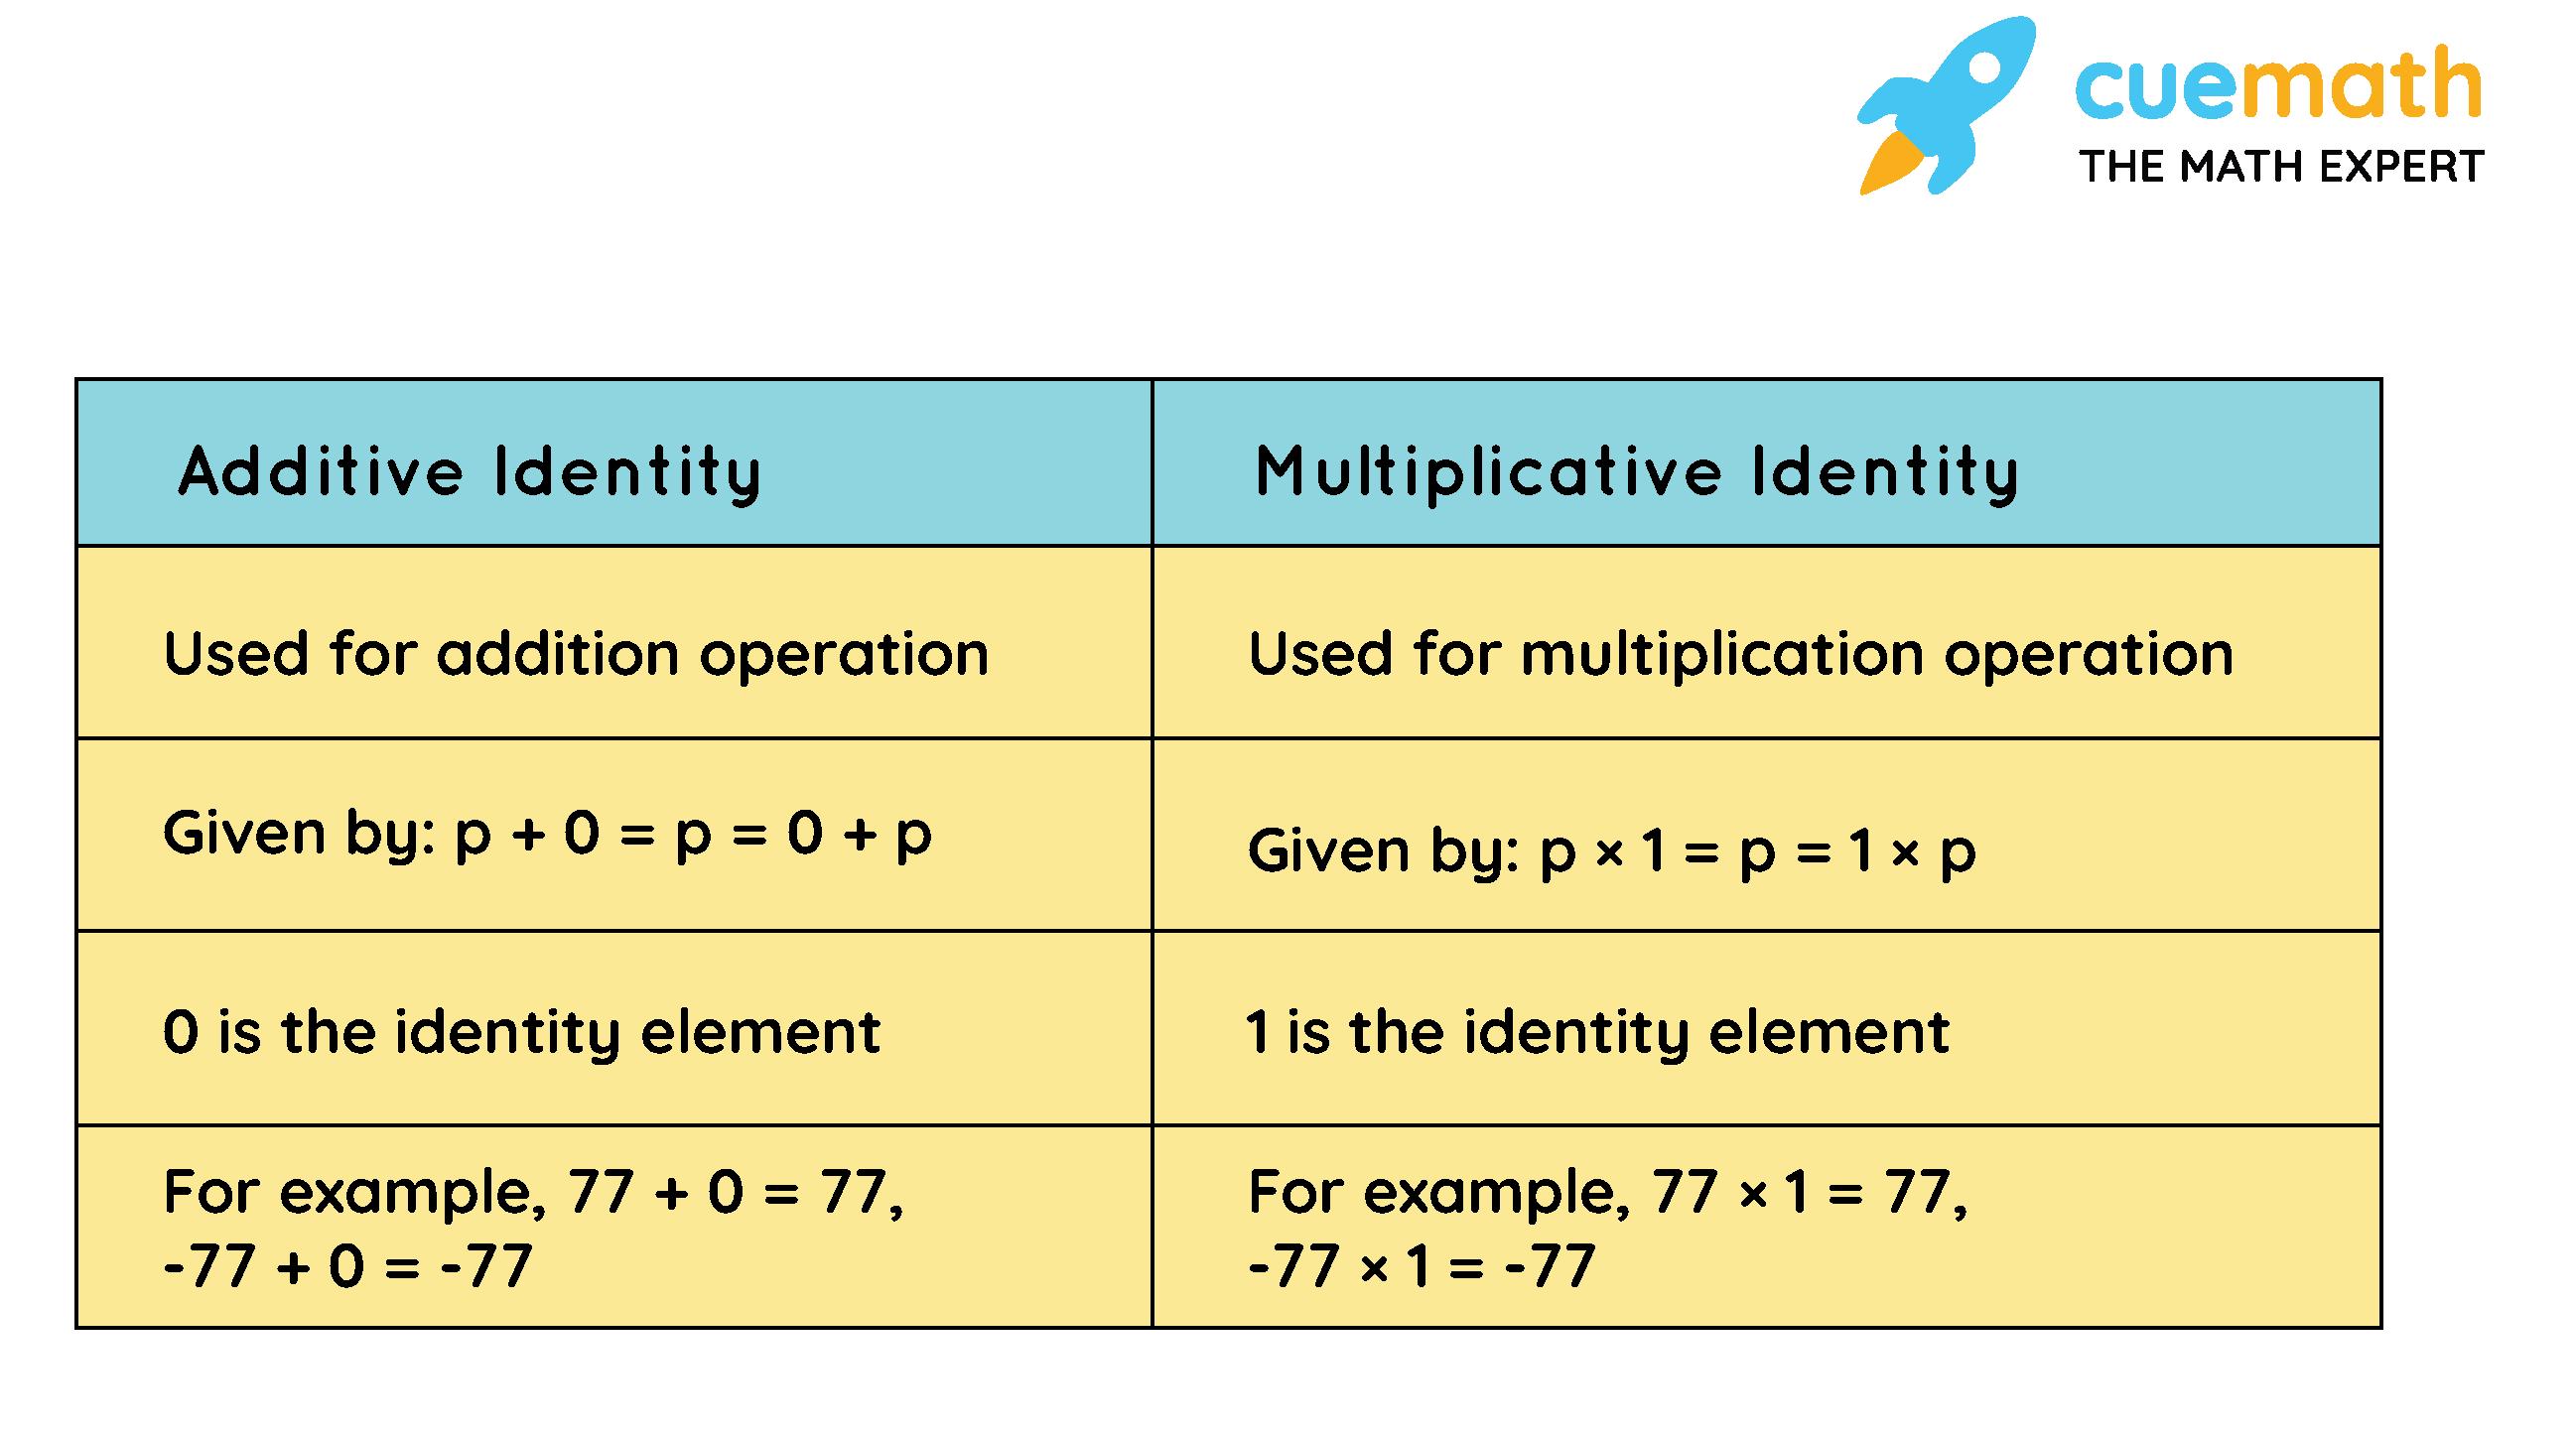 Additive Identity vs Multiplicative Identity